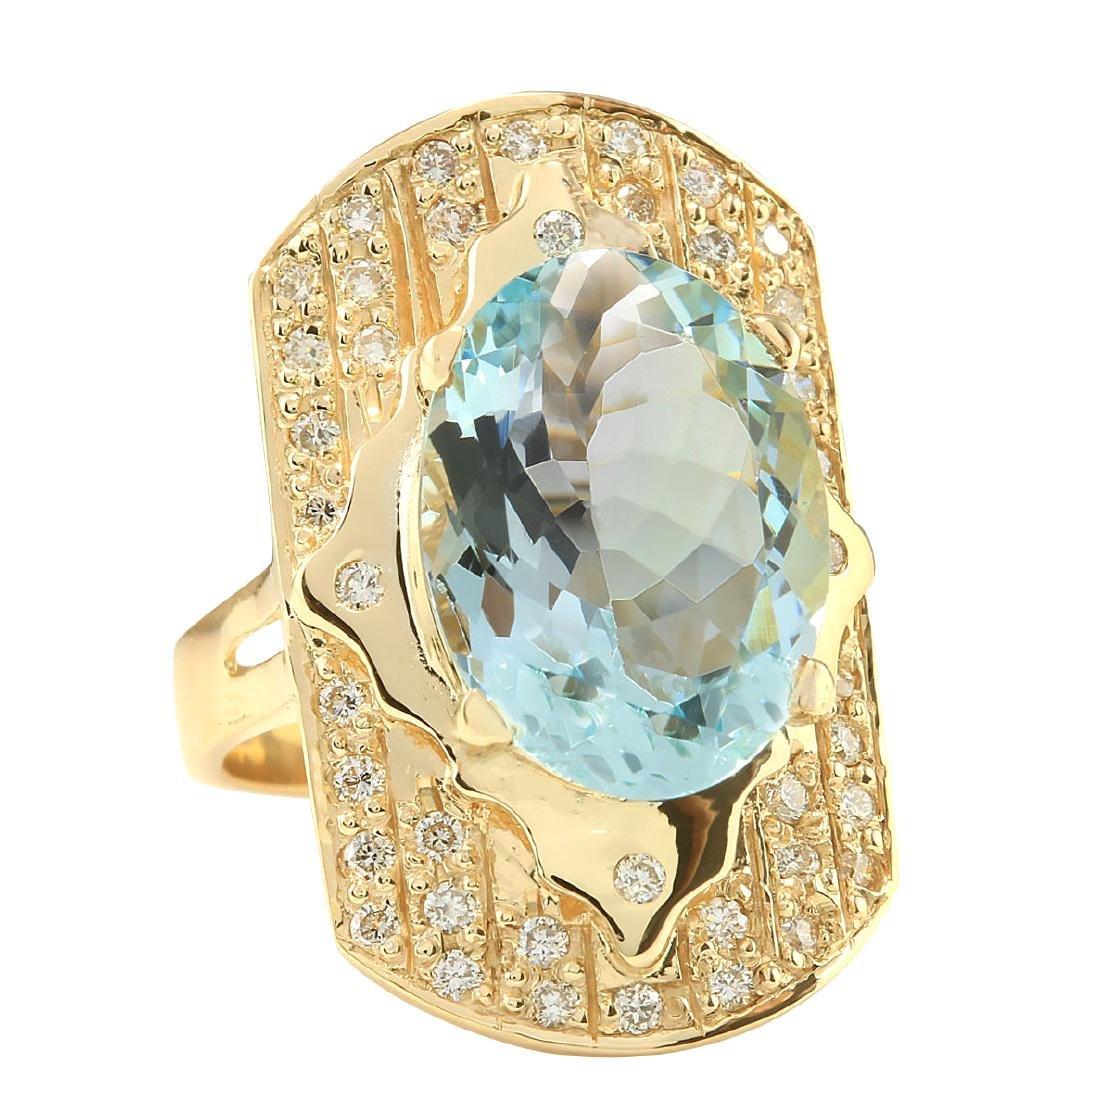 7.35CTW Natural Aquamarine And Diamond Ring In 18K - 2